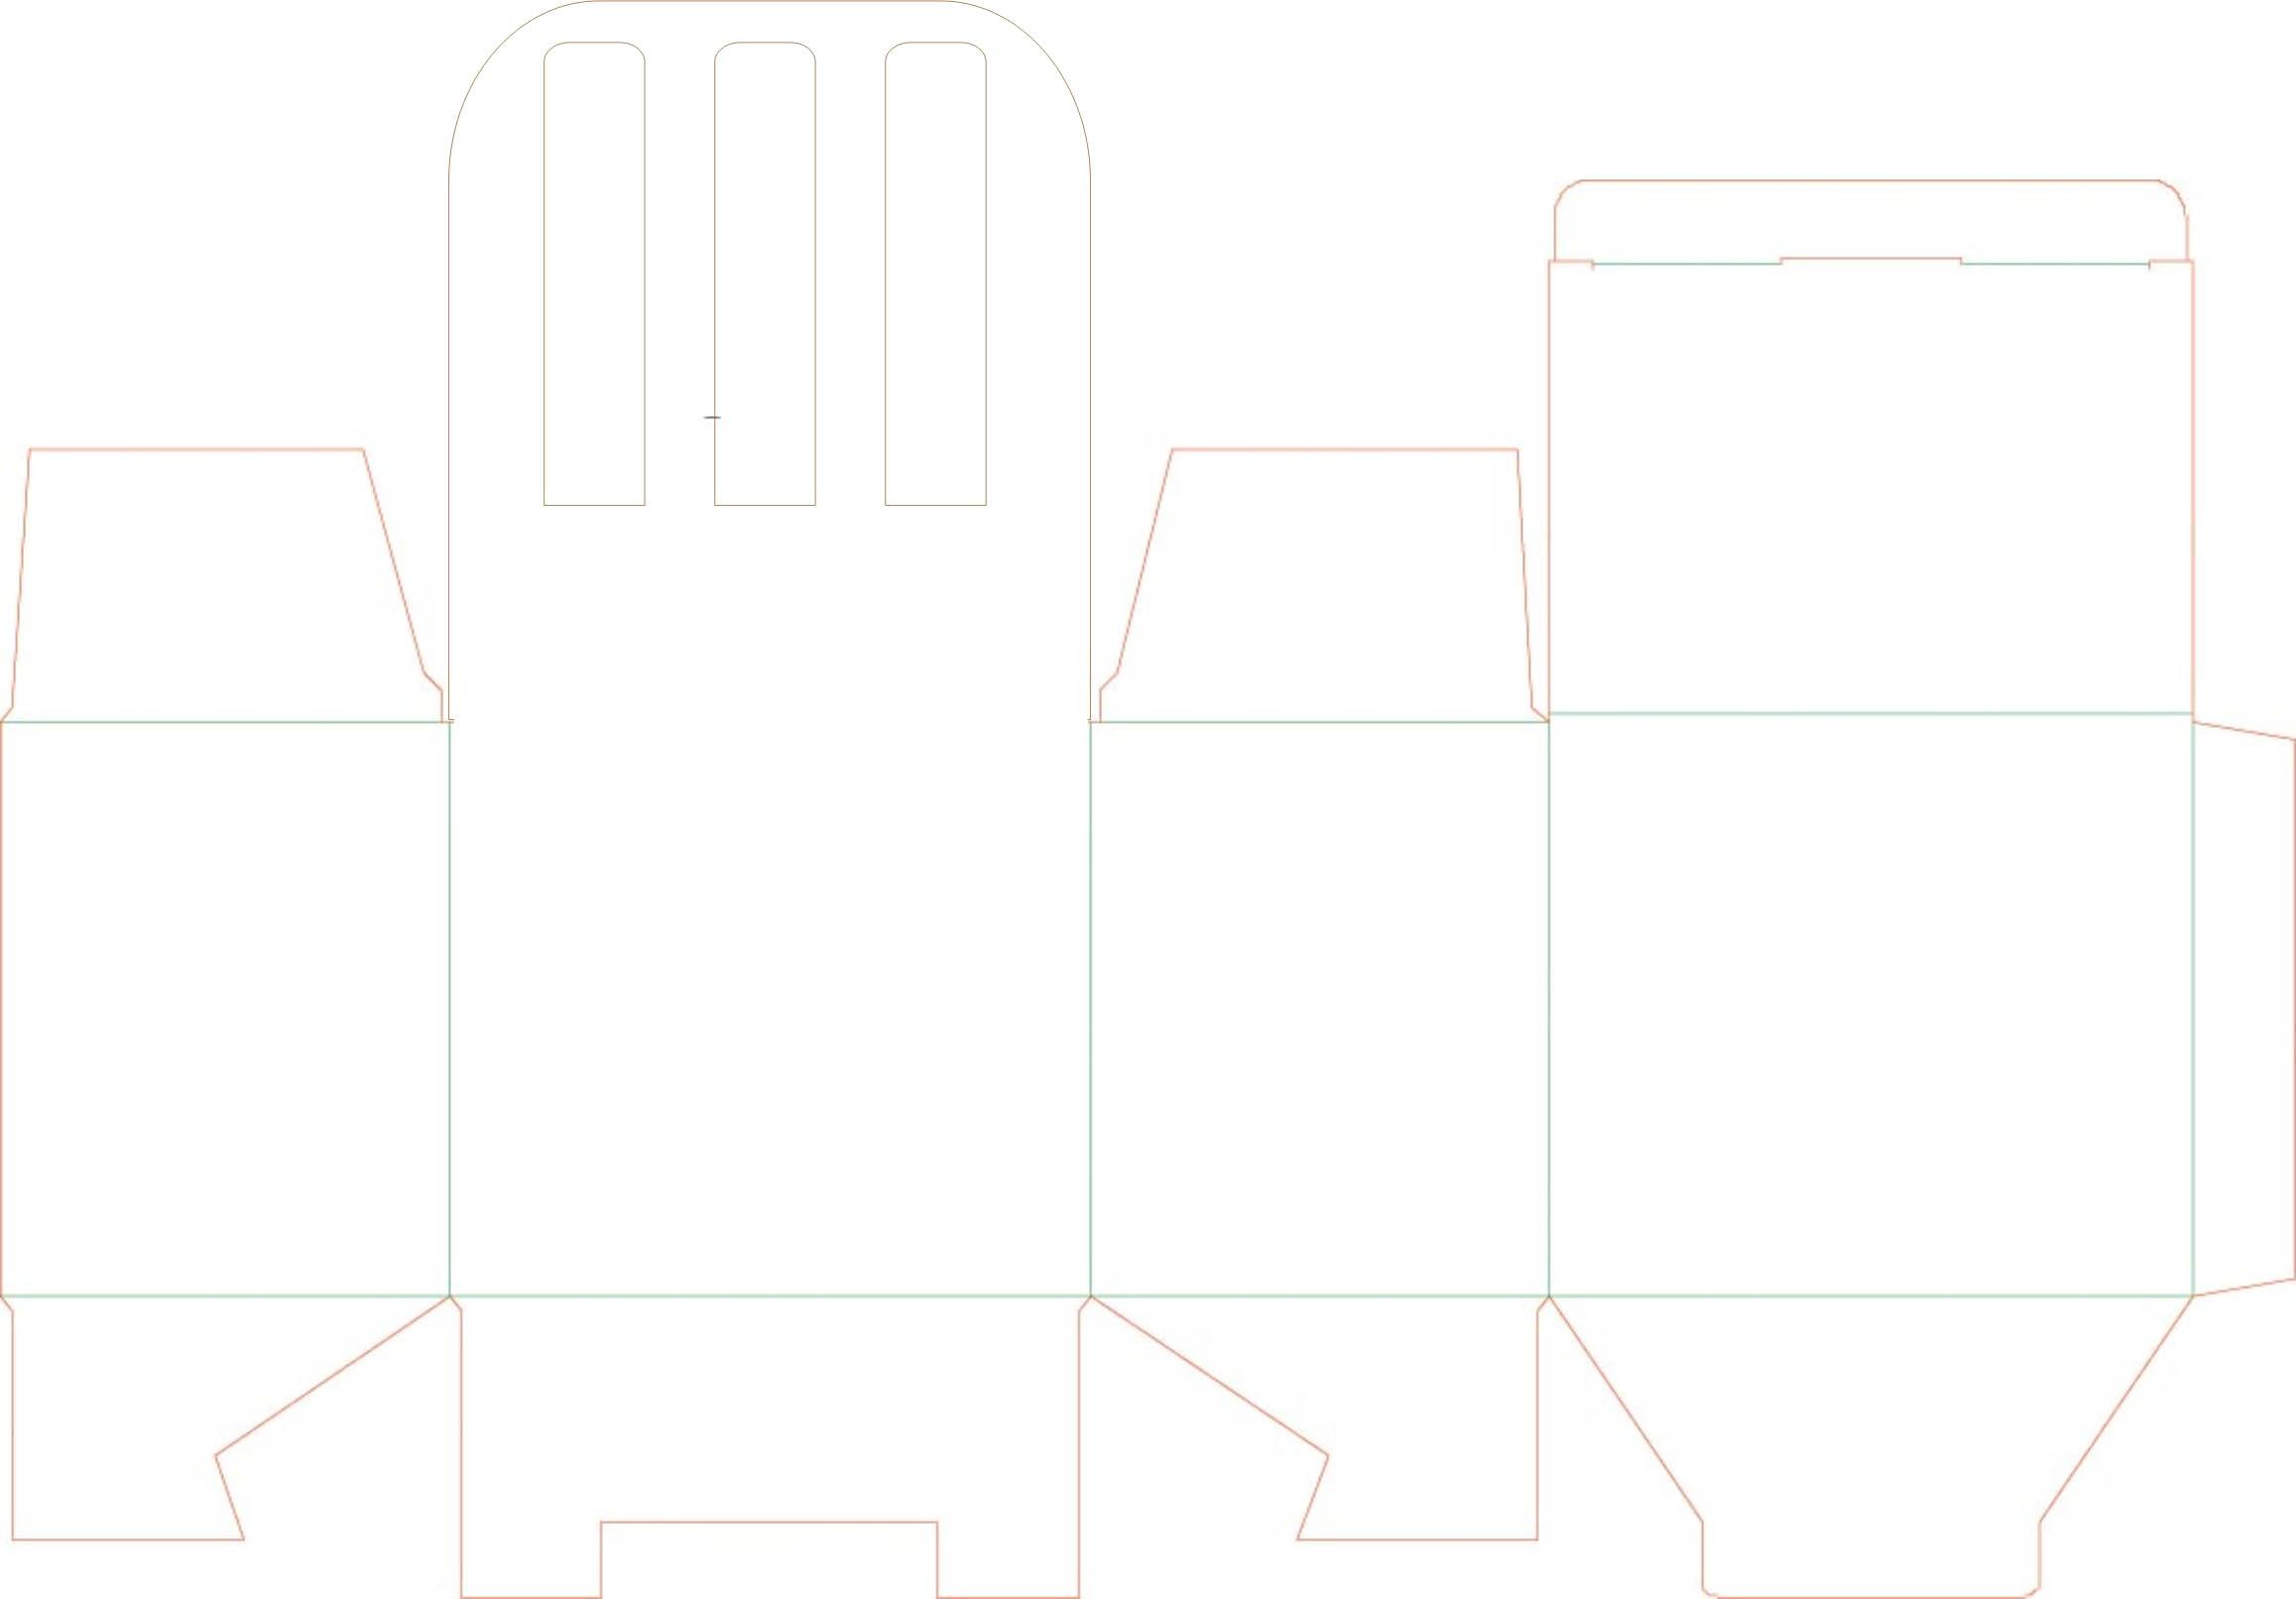 коробка в форме сердца своими руками схема для печати